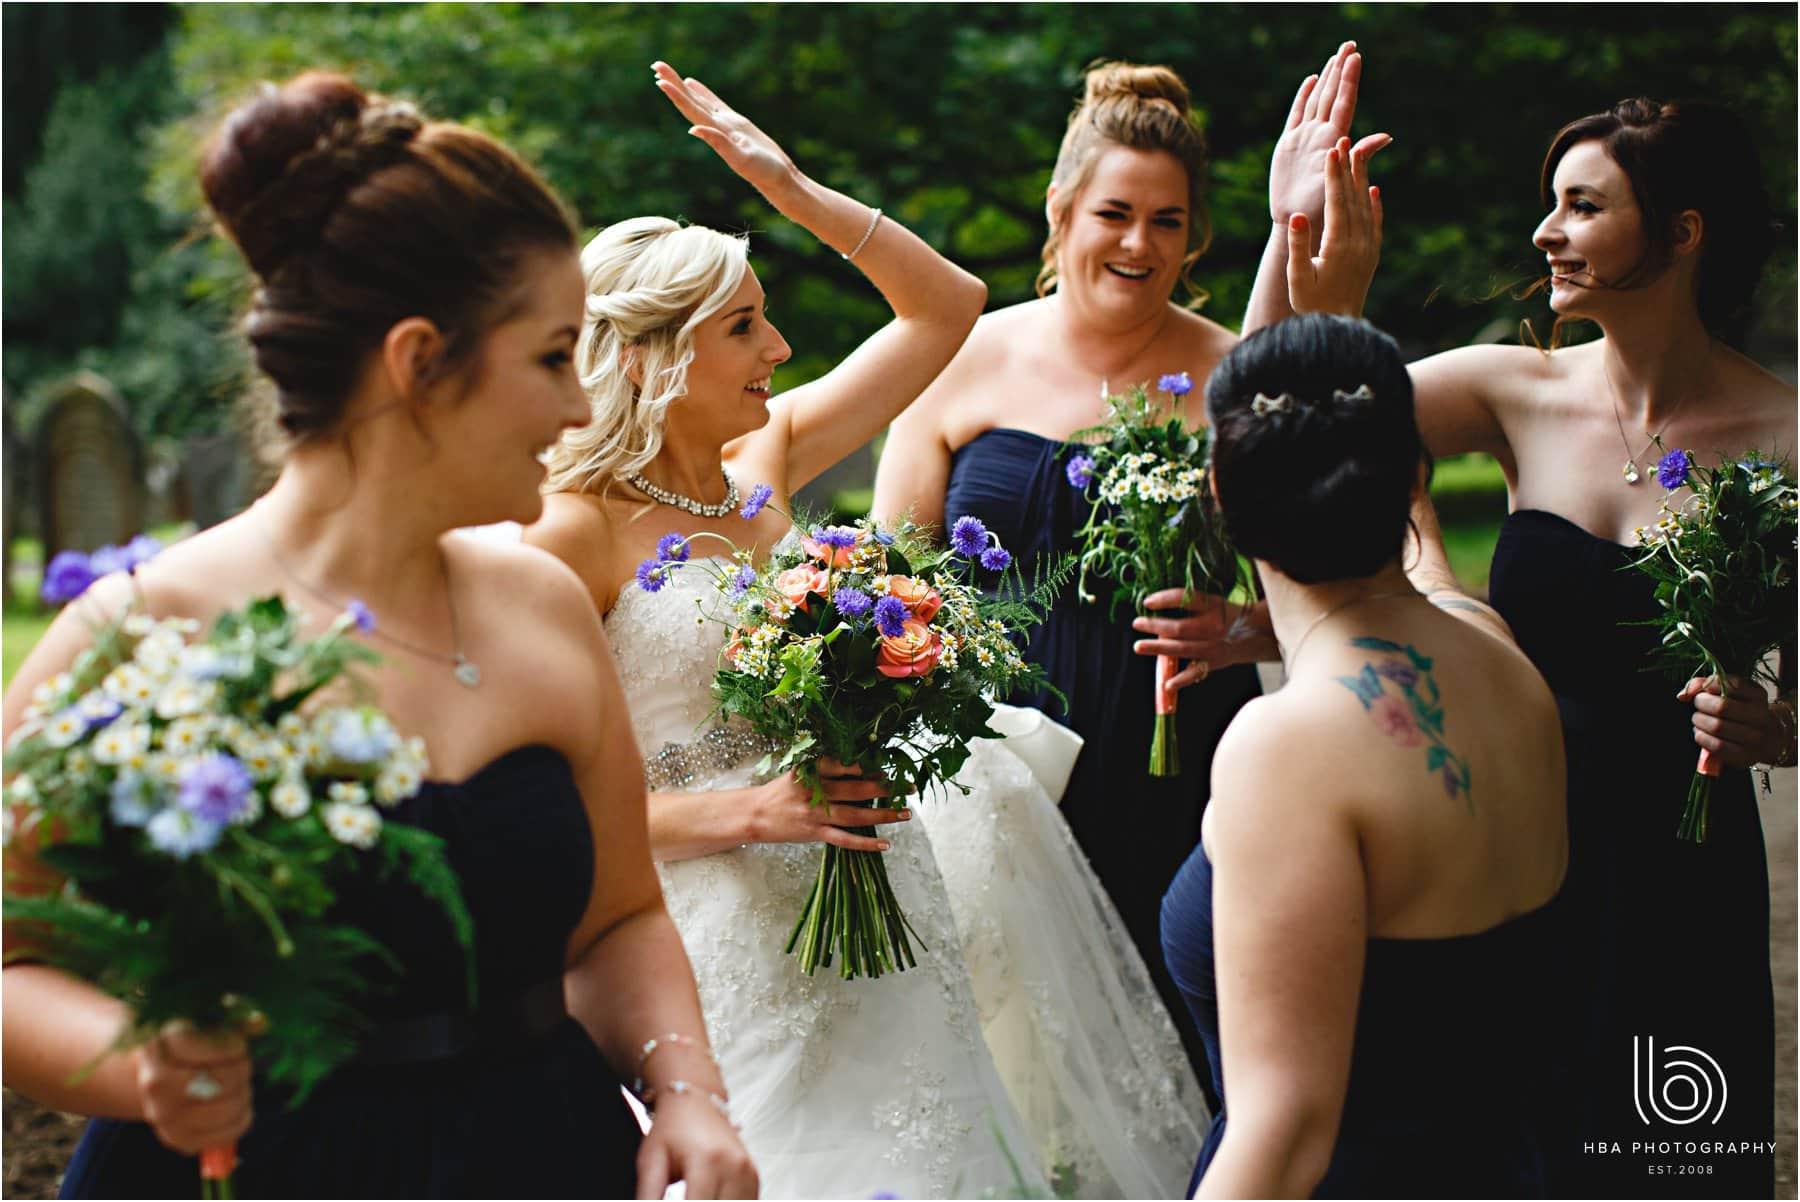 the bride & bridesmaids high fiving